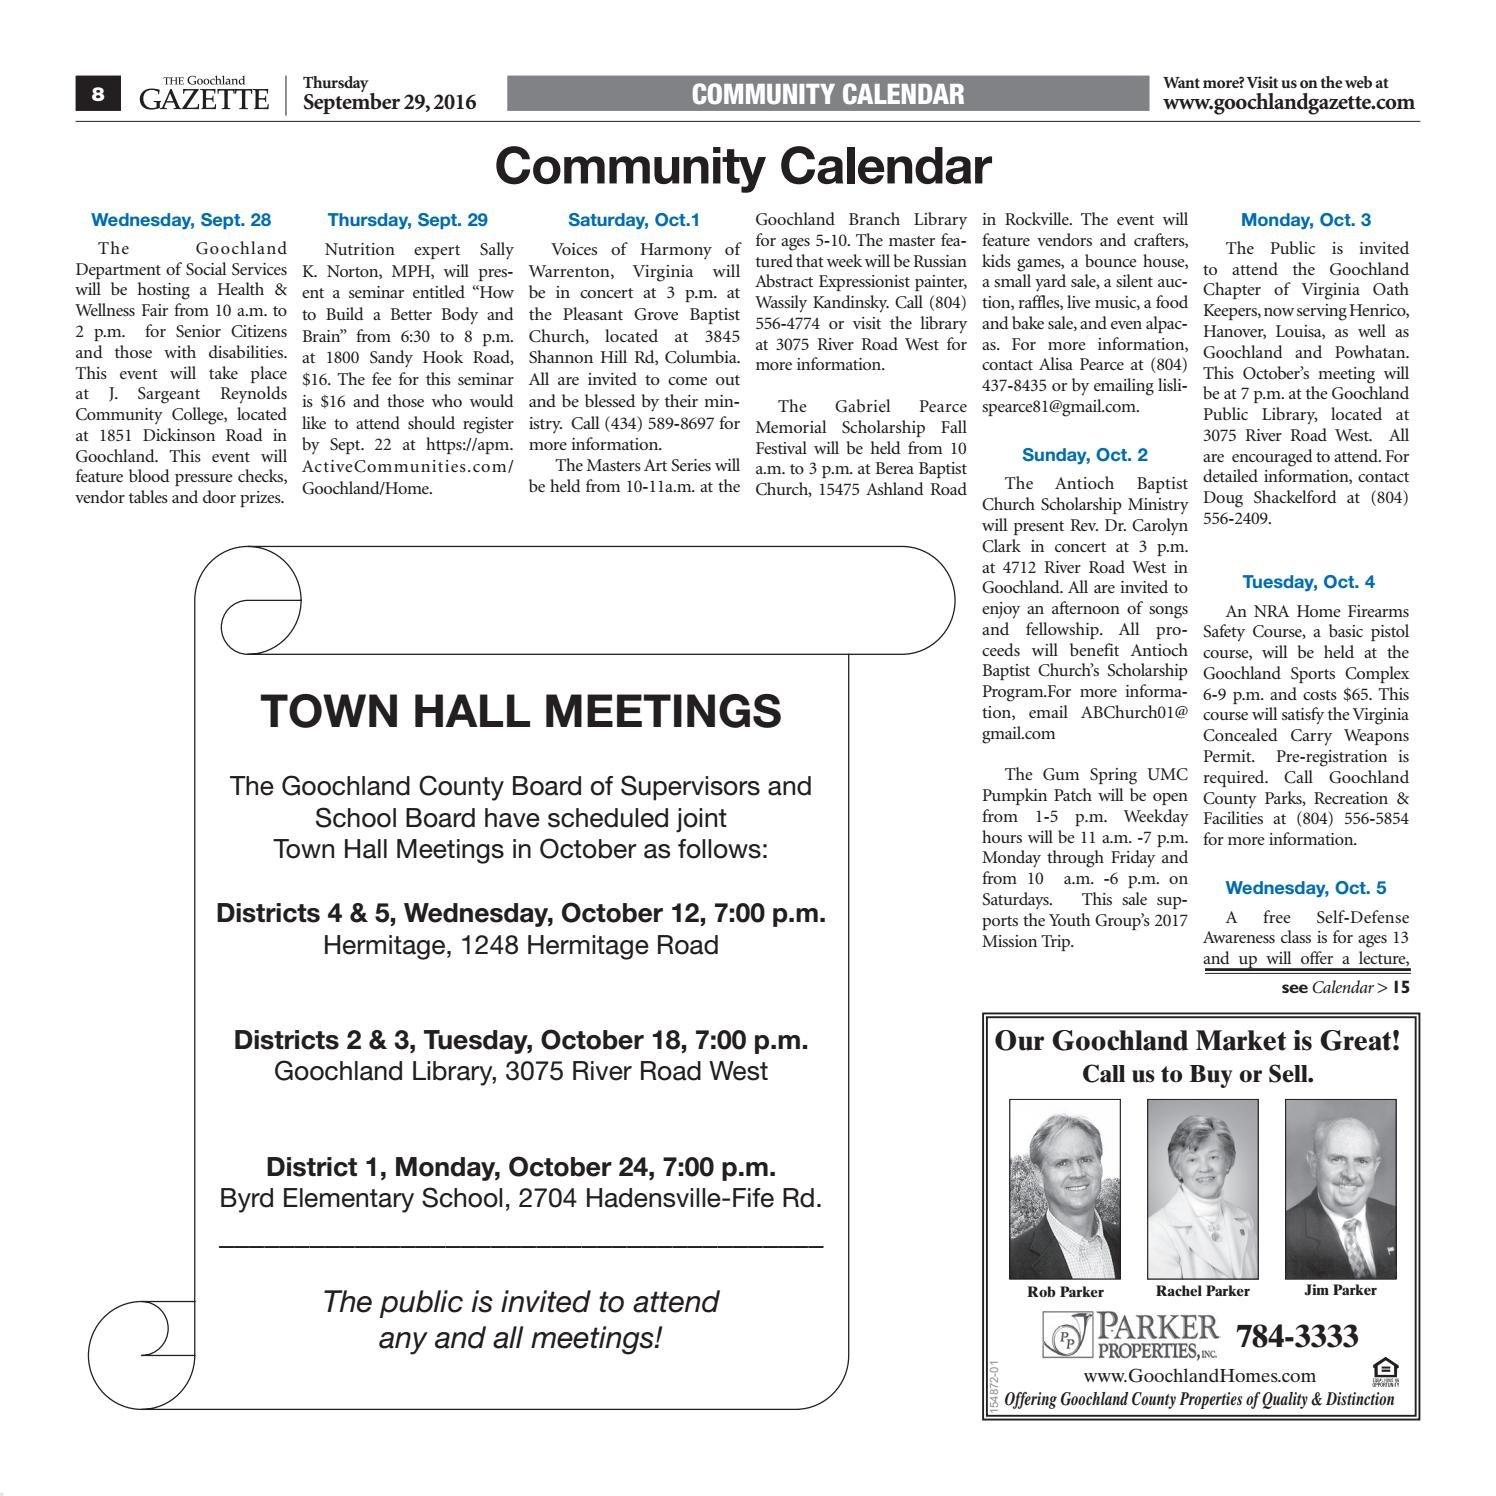 09/29/16Goochland Gazette – Issuu J Sargeant Reynolds Calendar 2019